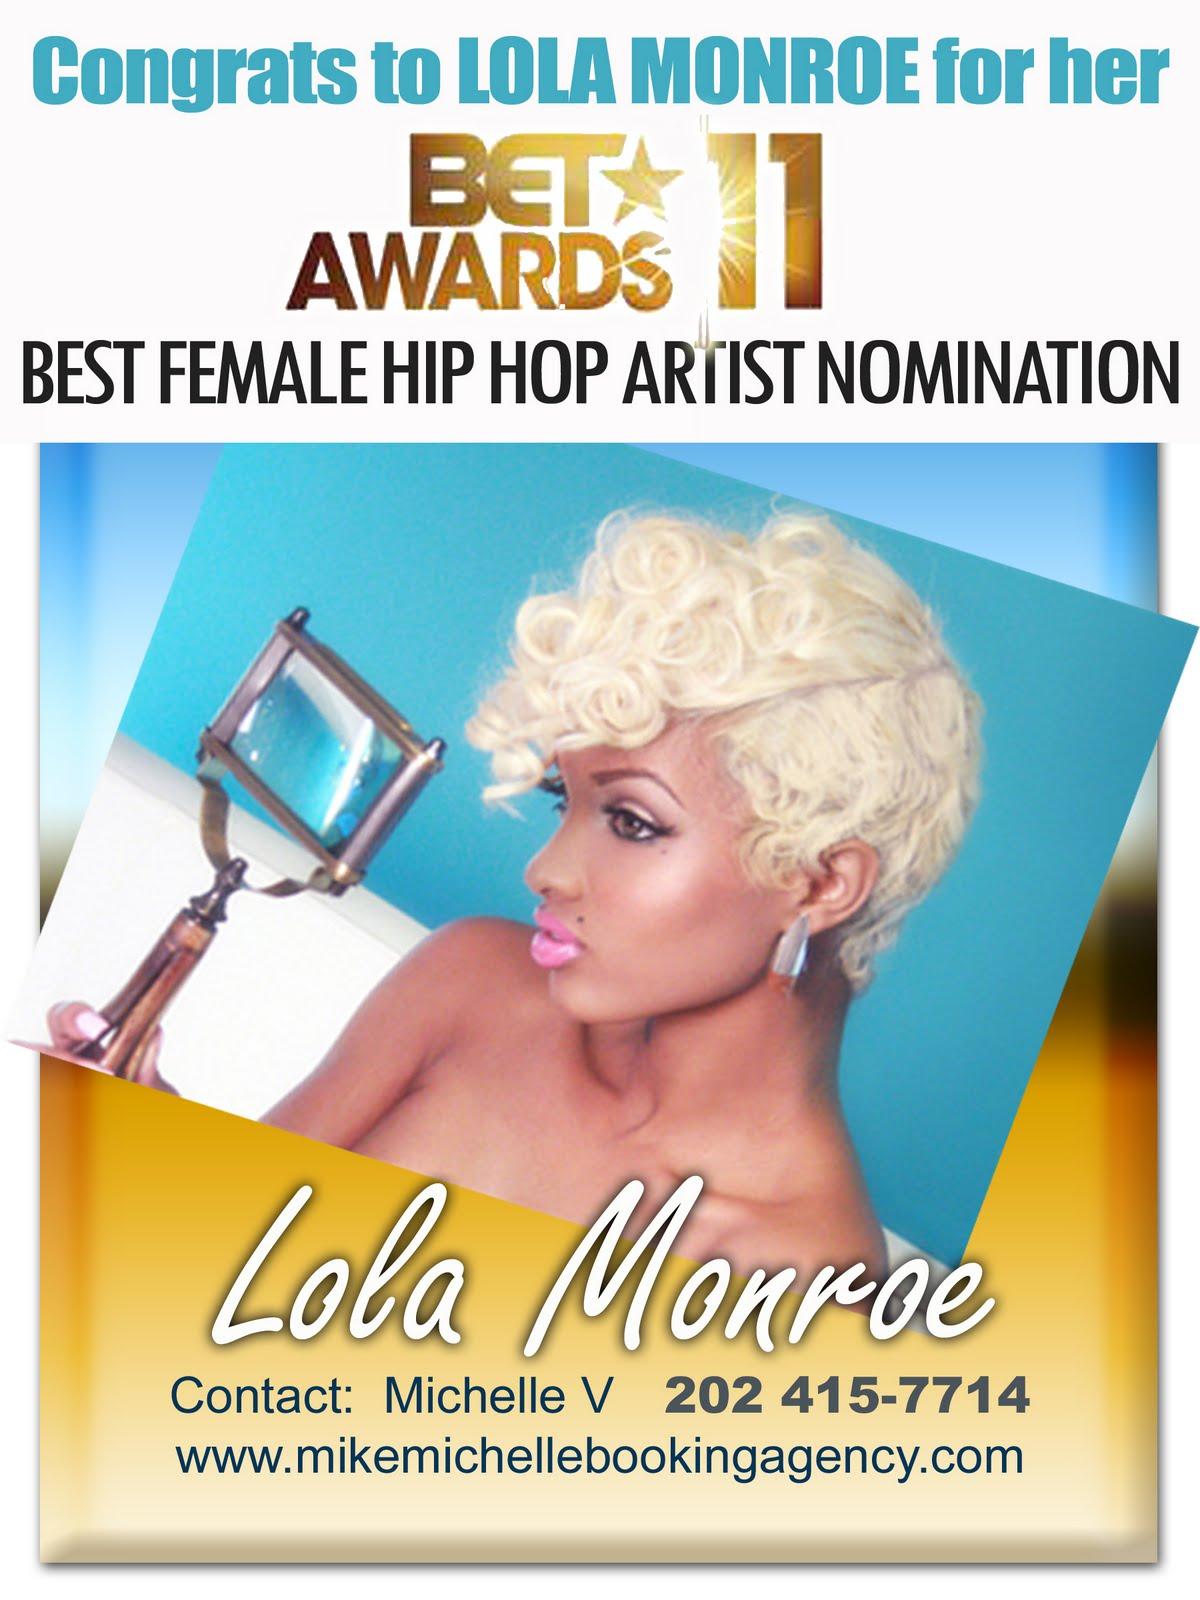 Lola Monroe Hairstyles Follow lola monroe on twitter